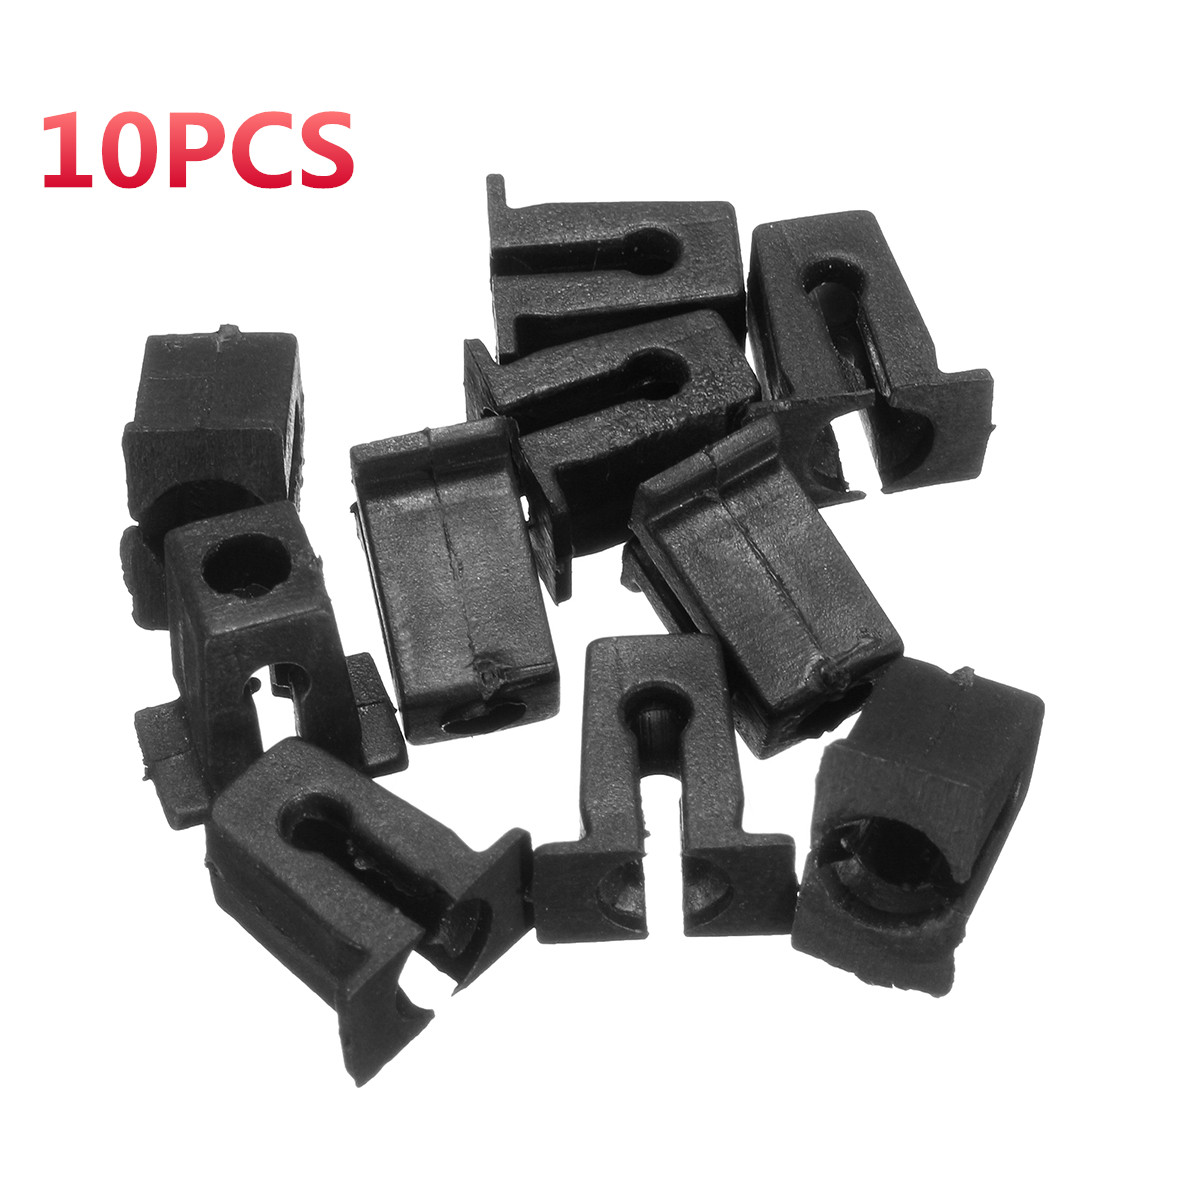 10x Clips For Mercedes Audi Vw Push Type Mounting Rivet Clips Black Plastic